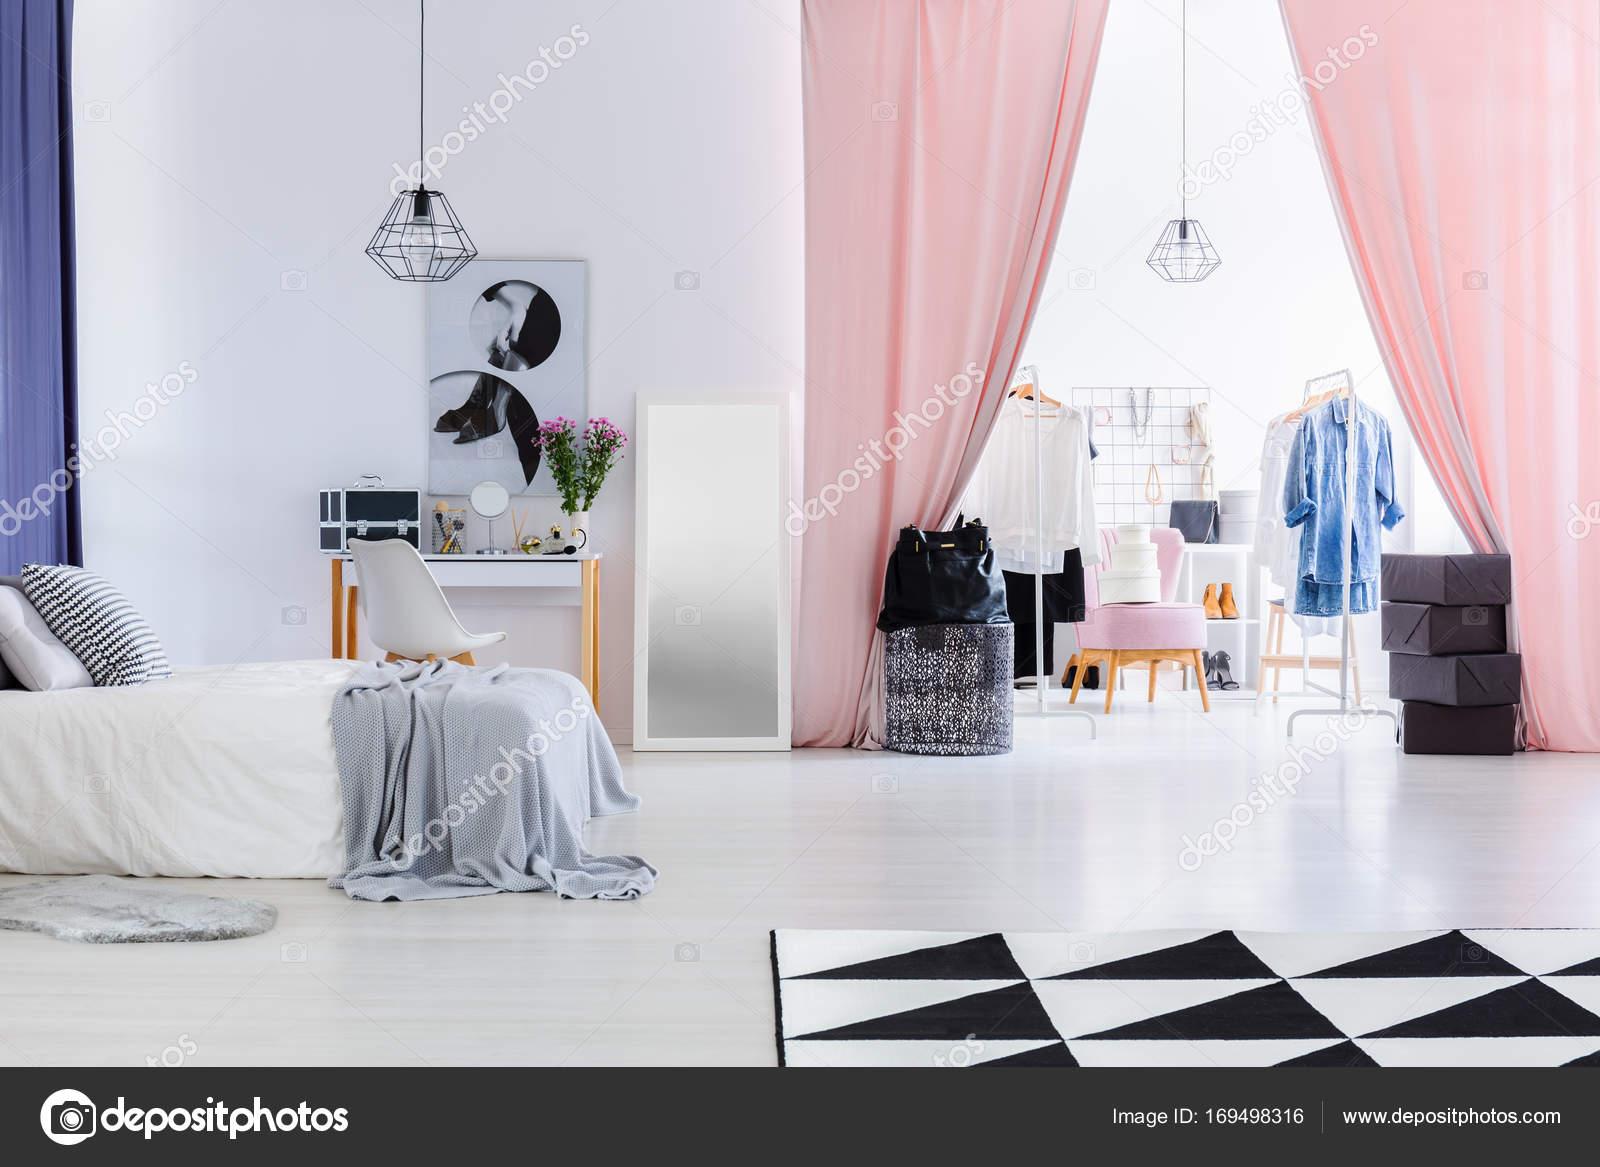 Gordijnen In Slaapkamer : Roze fluwelen gordijnen in de slaapkamer u stockfoto